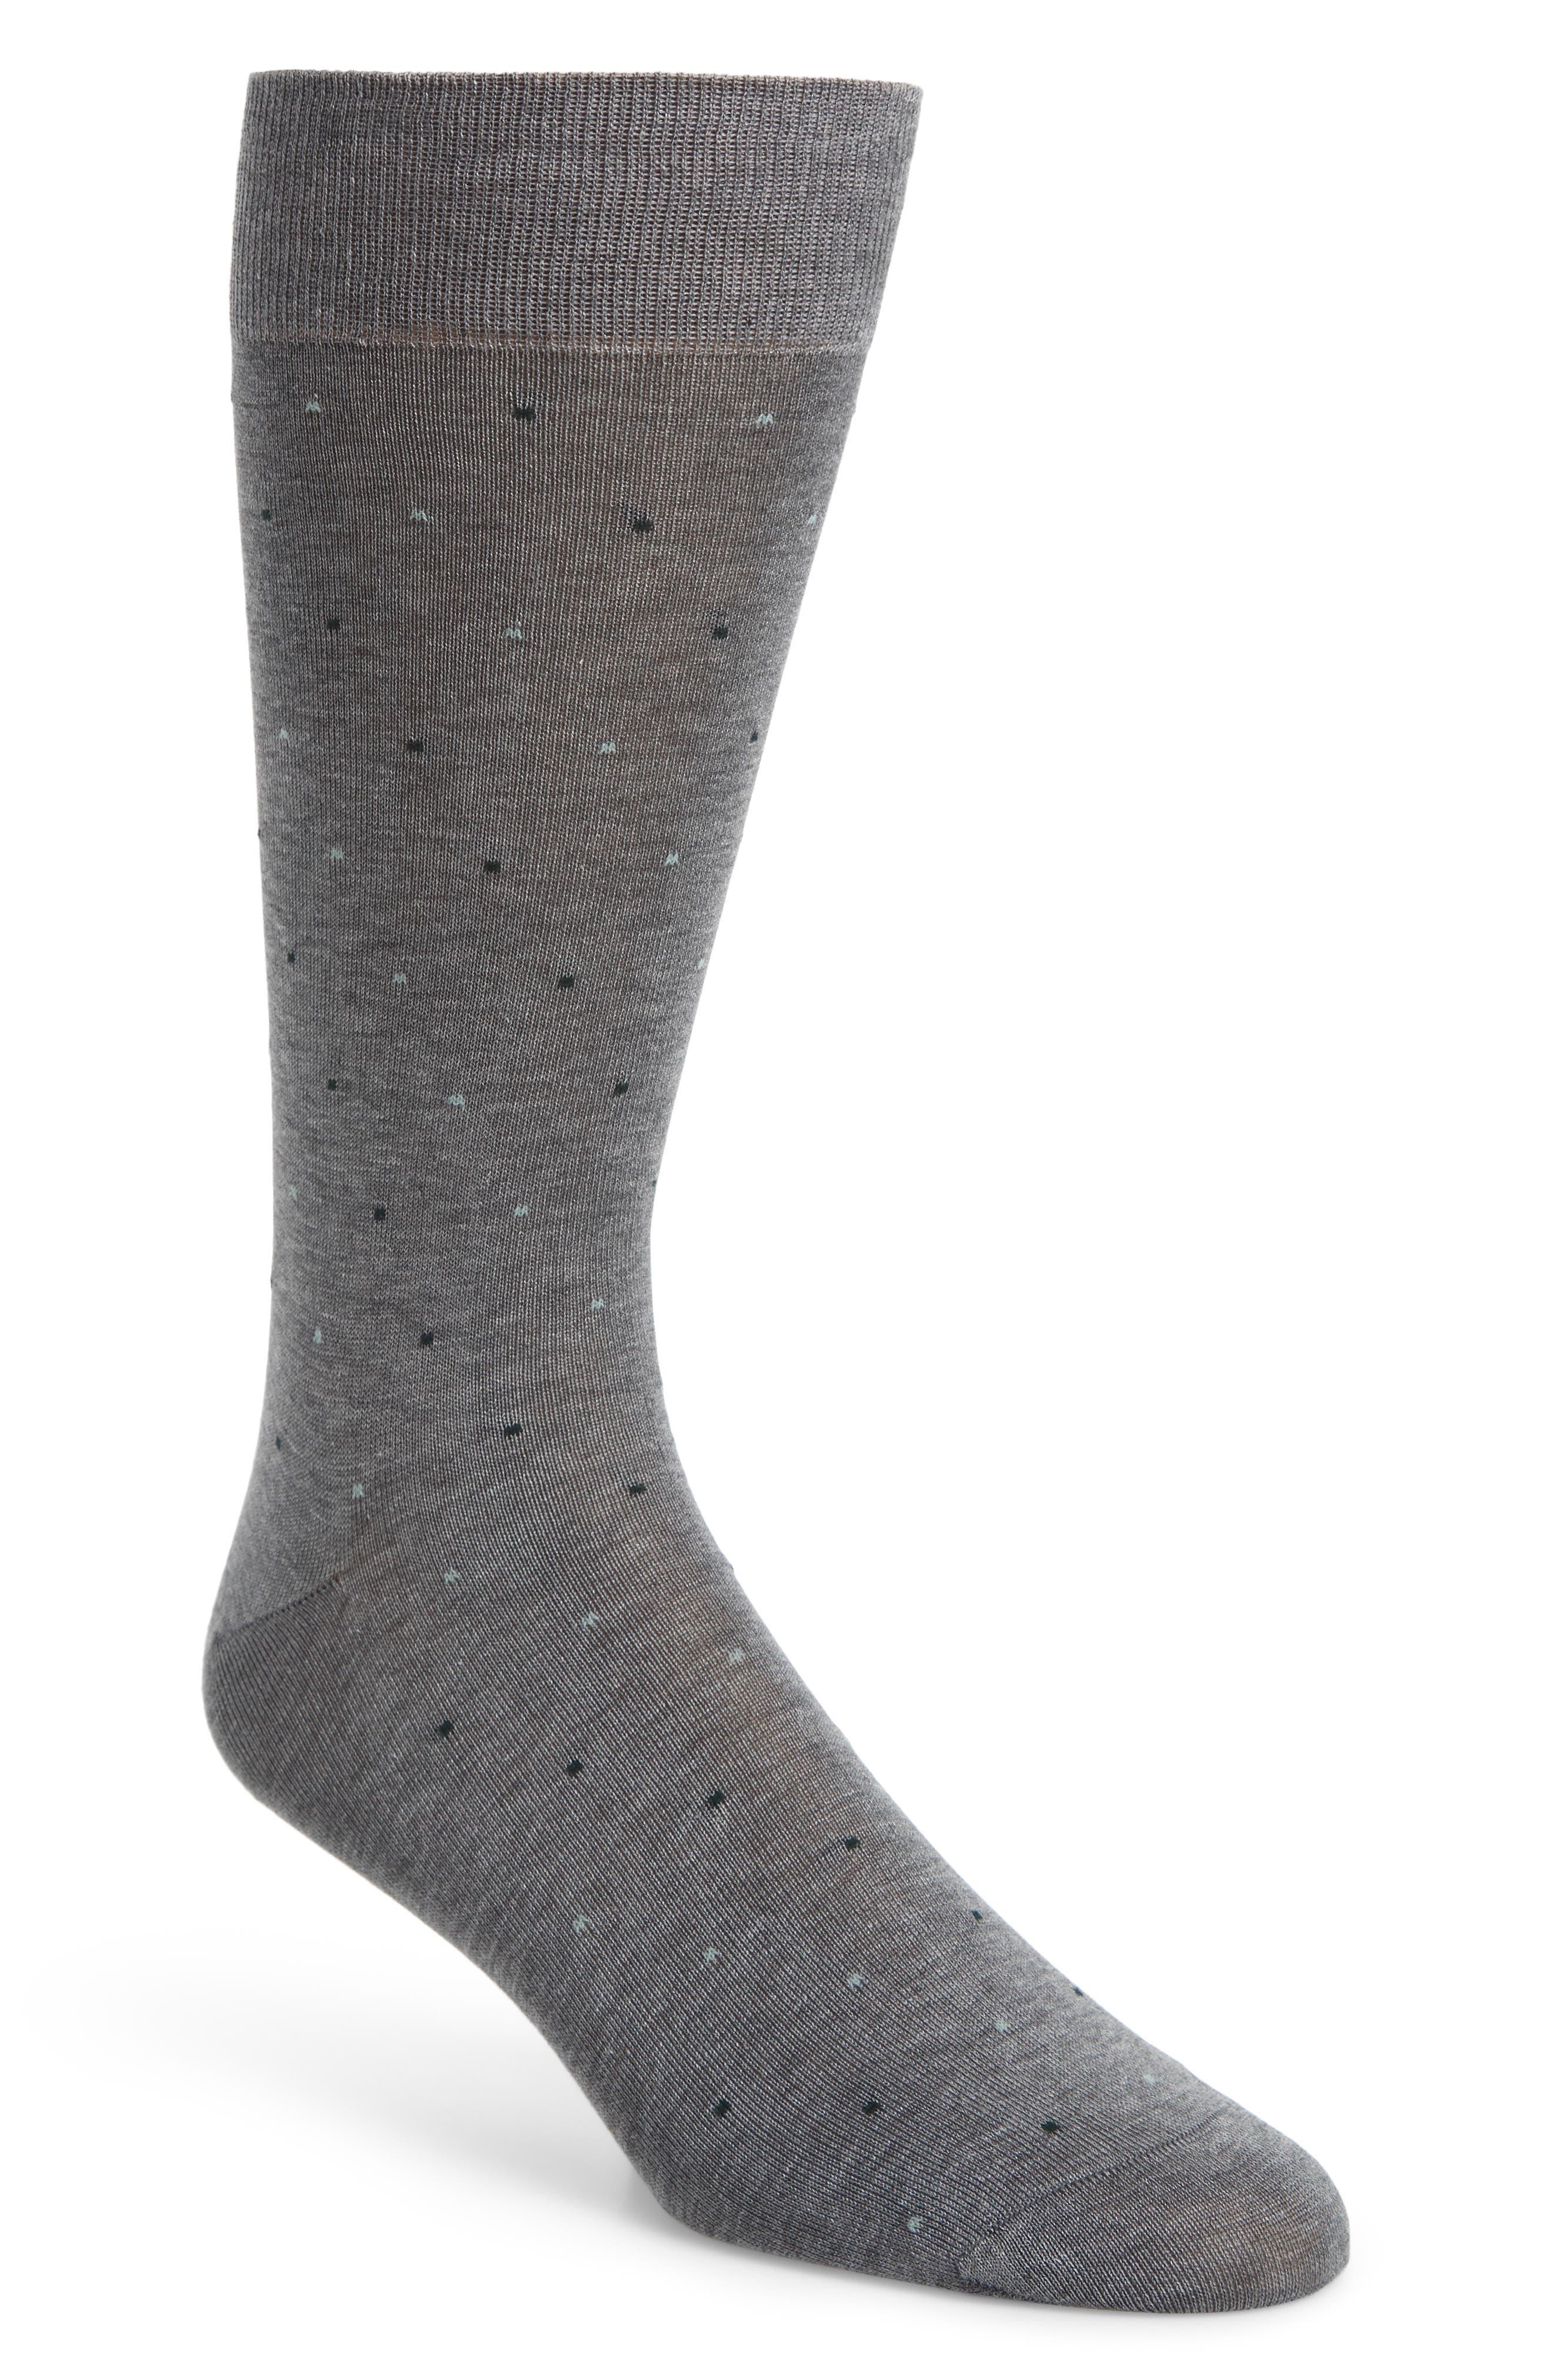 Neat Dot Socks,                         Main,                         color, 031